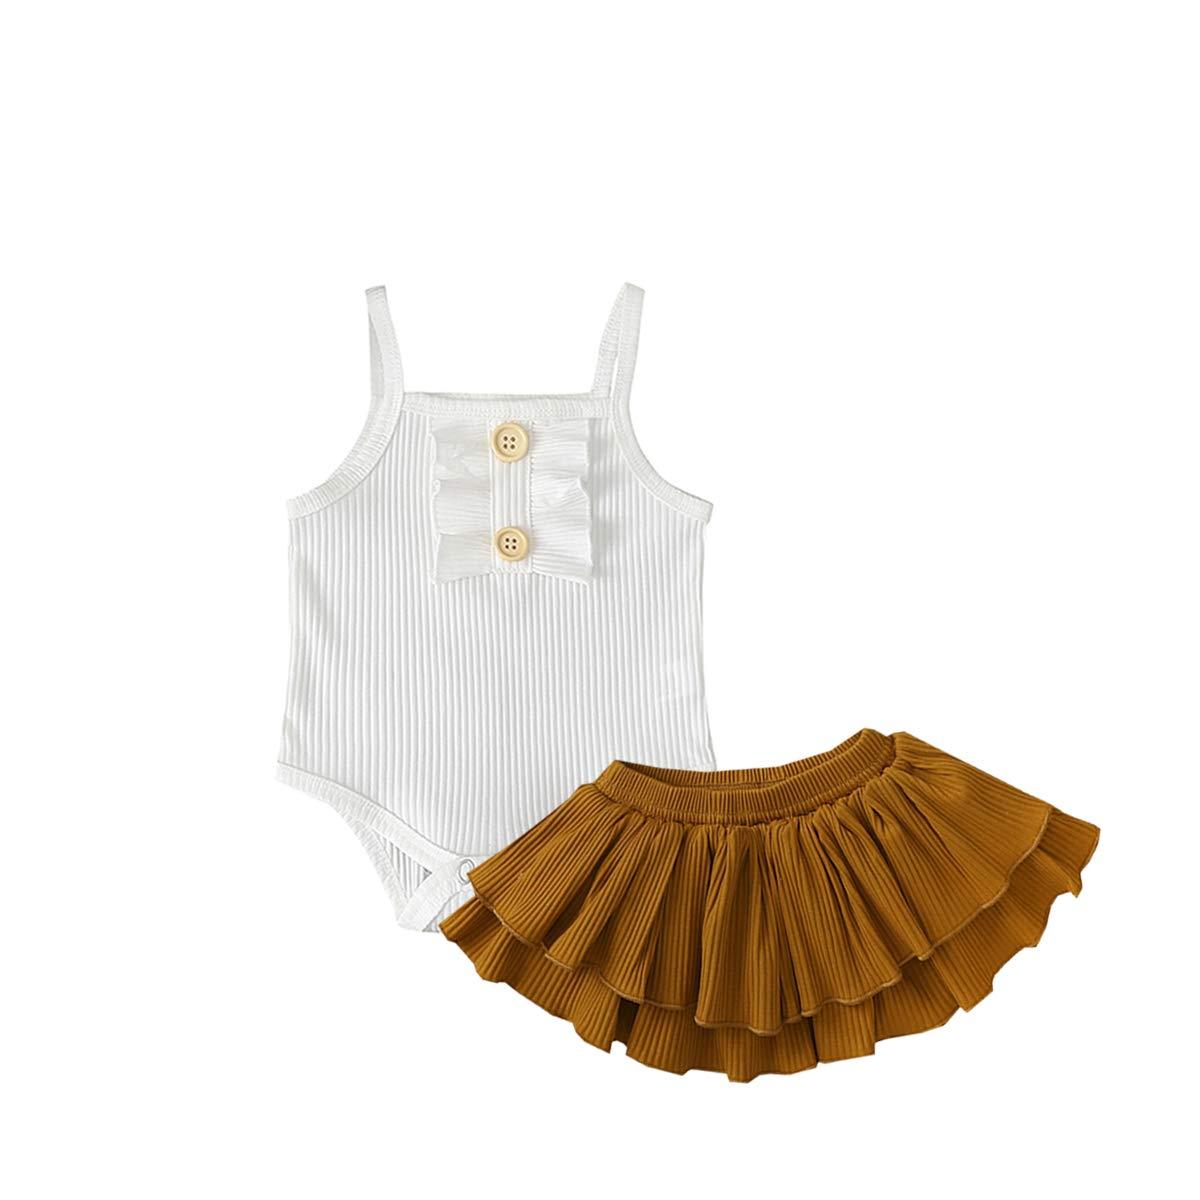 Newborn Infant Baby Girls Summer Outfits Ruffle Button Halter Romper Shorts Skirt Pants Bowknot Headband 3Pcs Clothes Sets